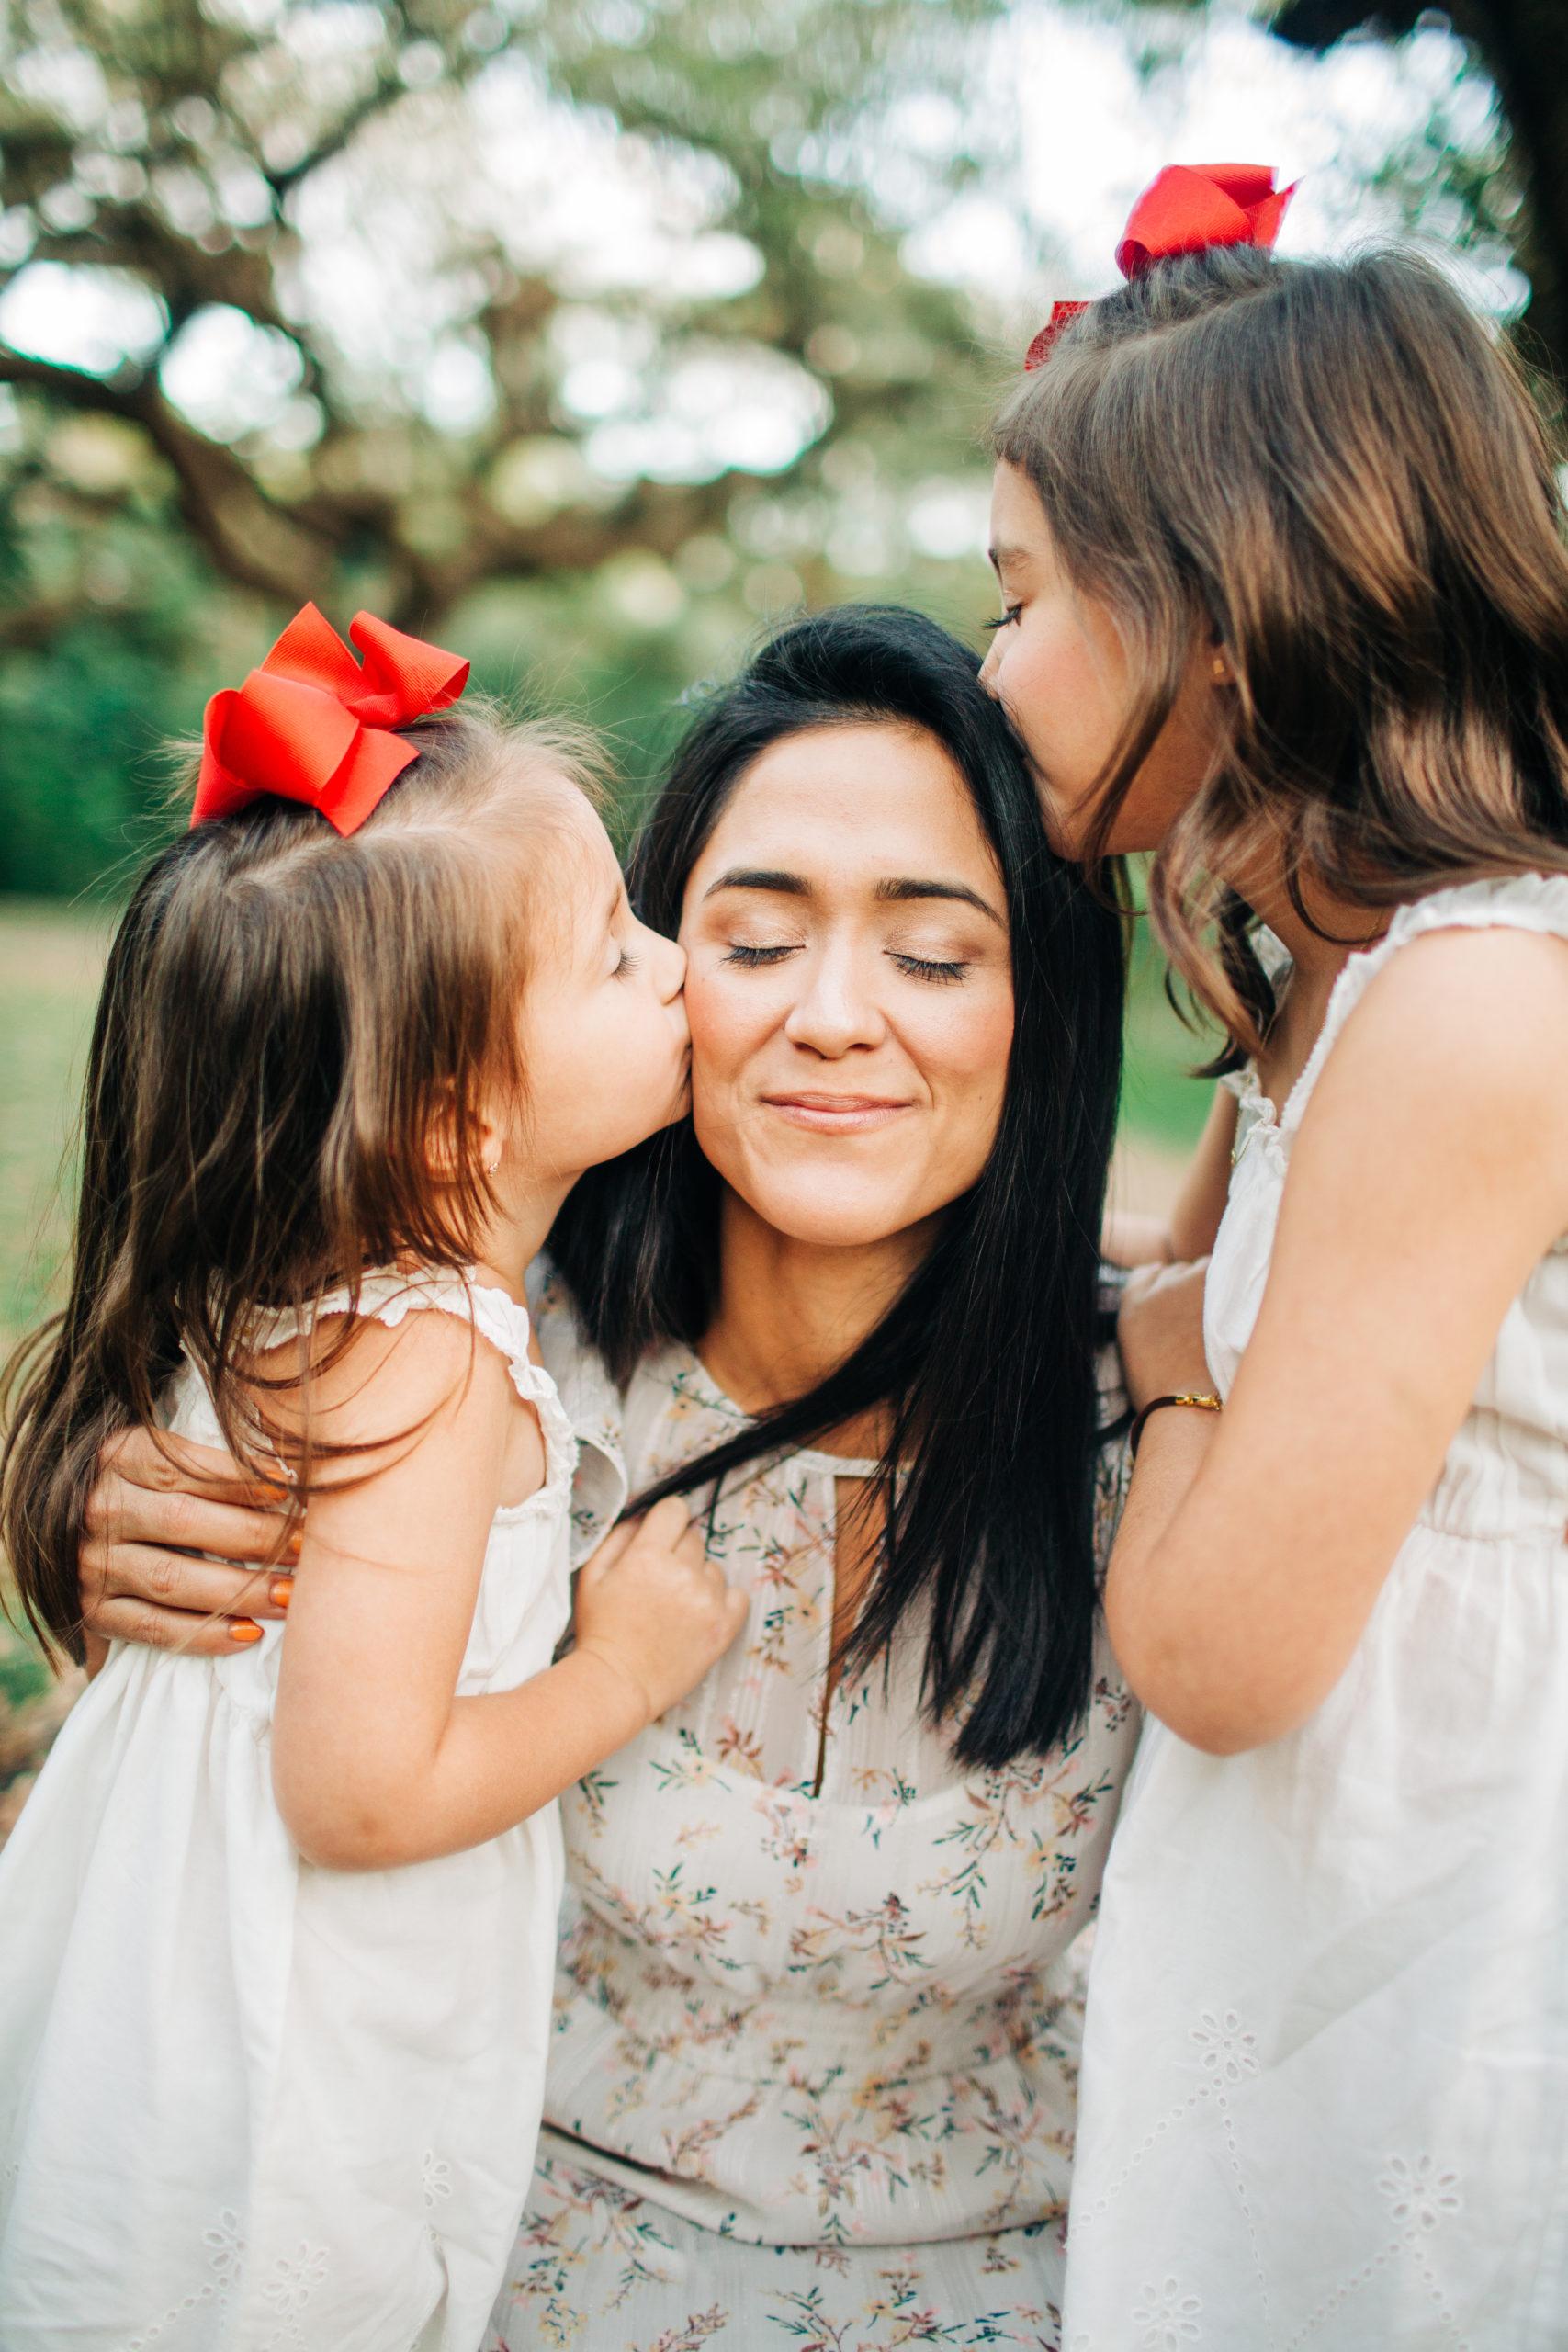 MotherhoodSessionPark_Miami-10-1-scaled Miami's 8 best Photoshoot Locations